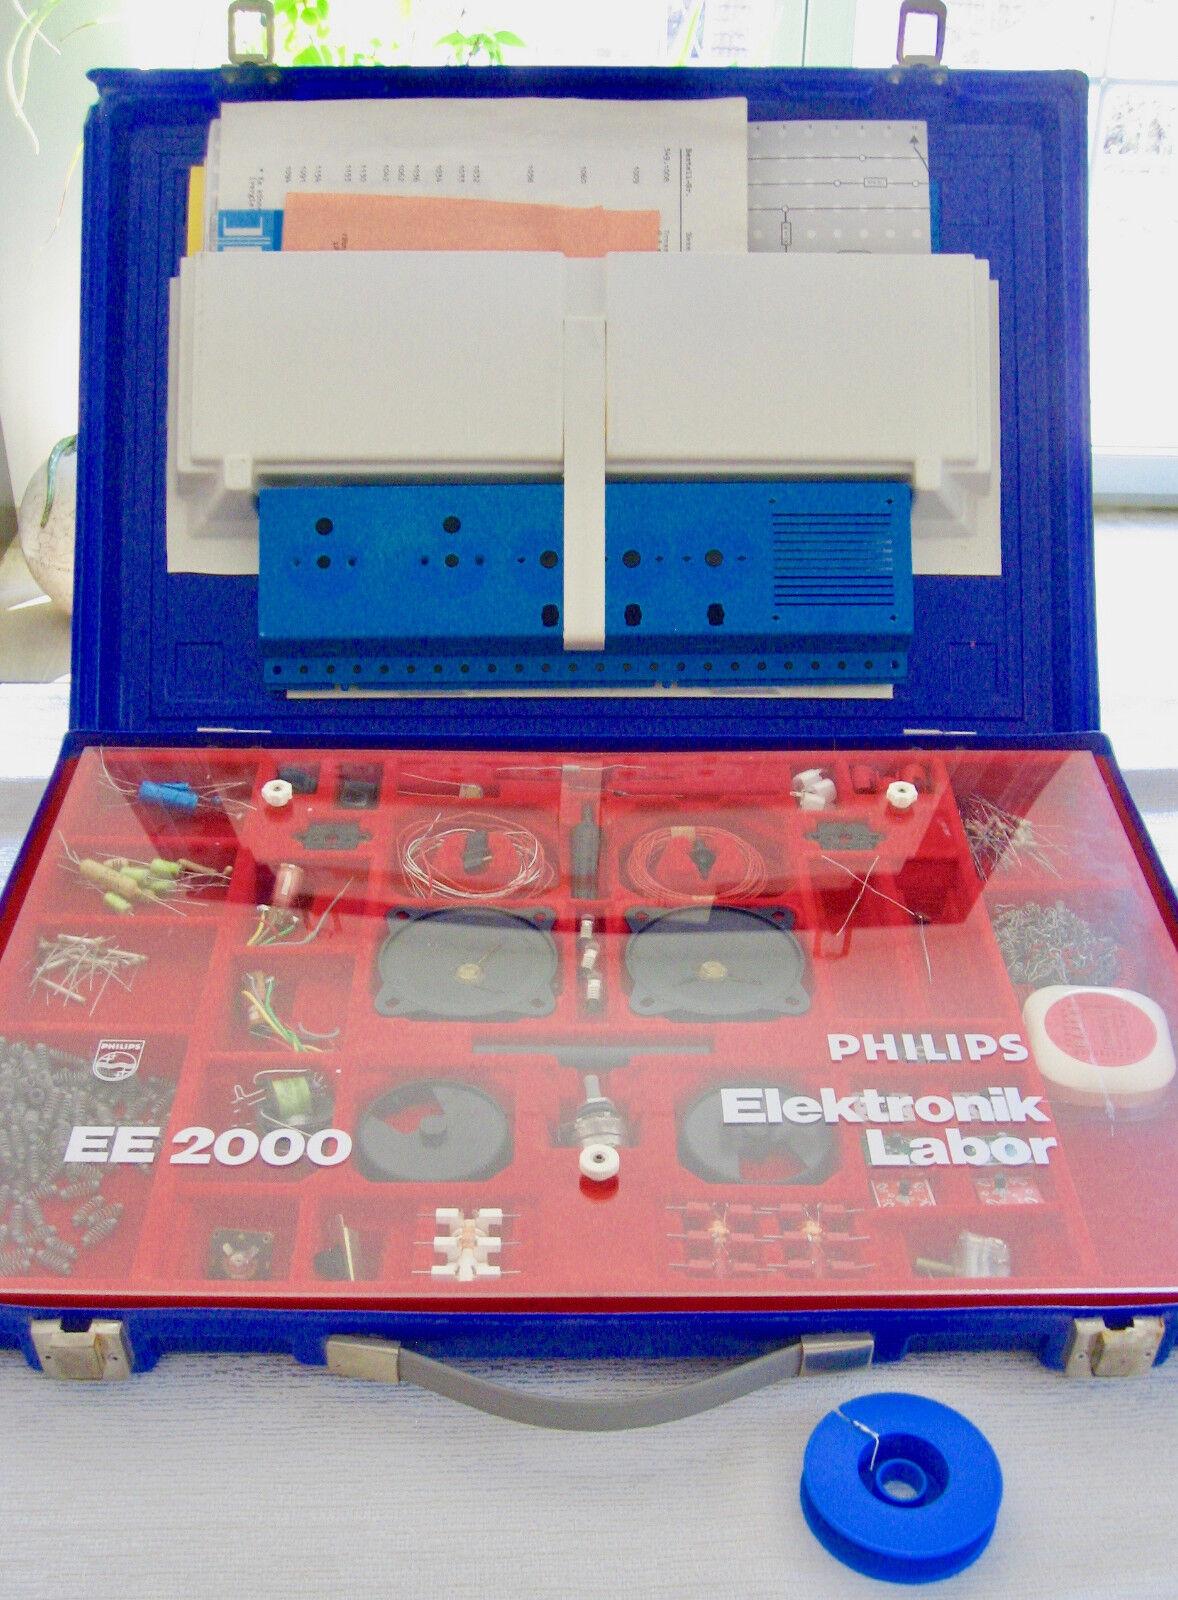 Philips Elektronik-Labor EE2000 Koffer Experimentierkästen 2003/04/05/06 Bauteil